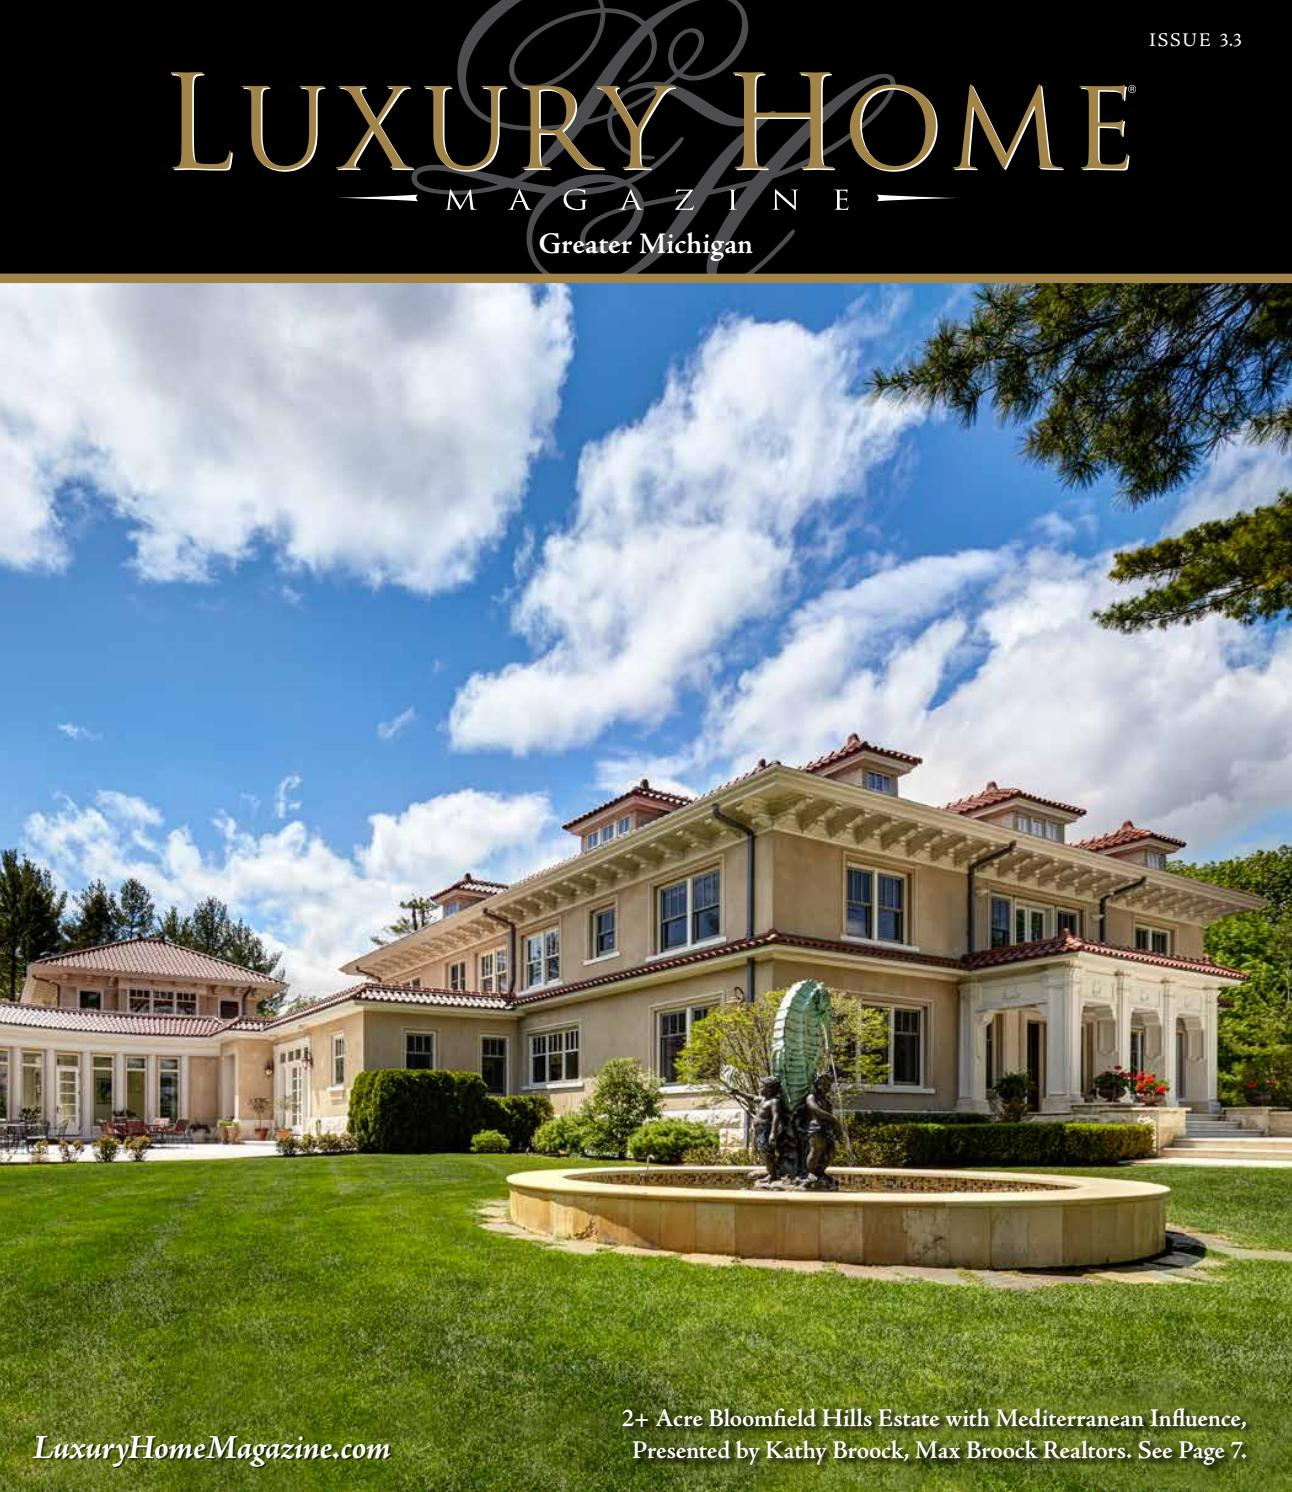 Lake Michigan Luxury Homes: Luxury Home Magazine Michigan Issue 3.3 By Luxury Home